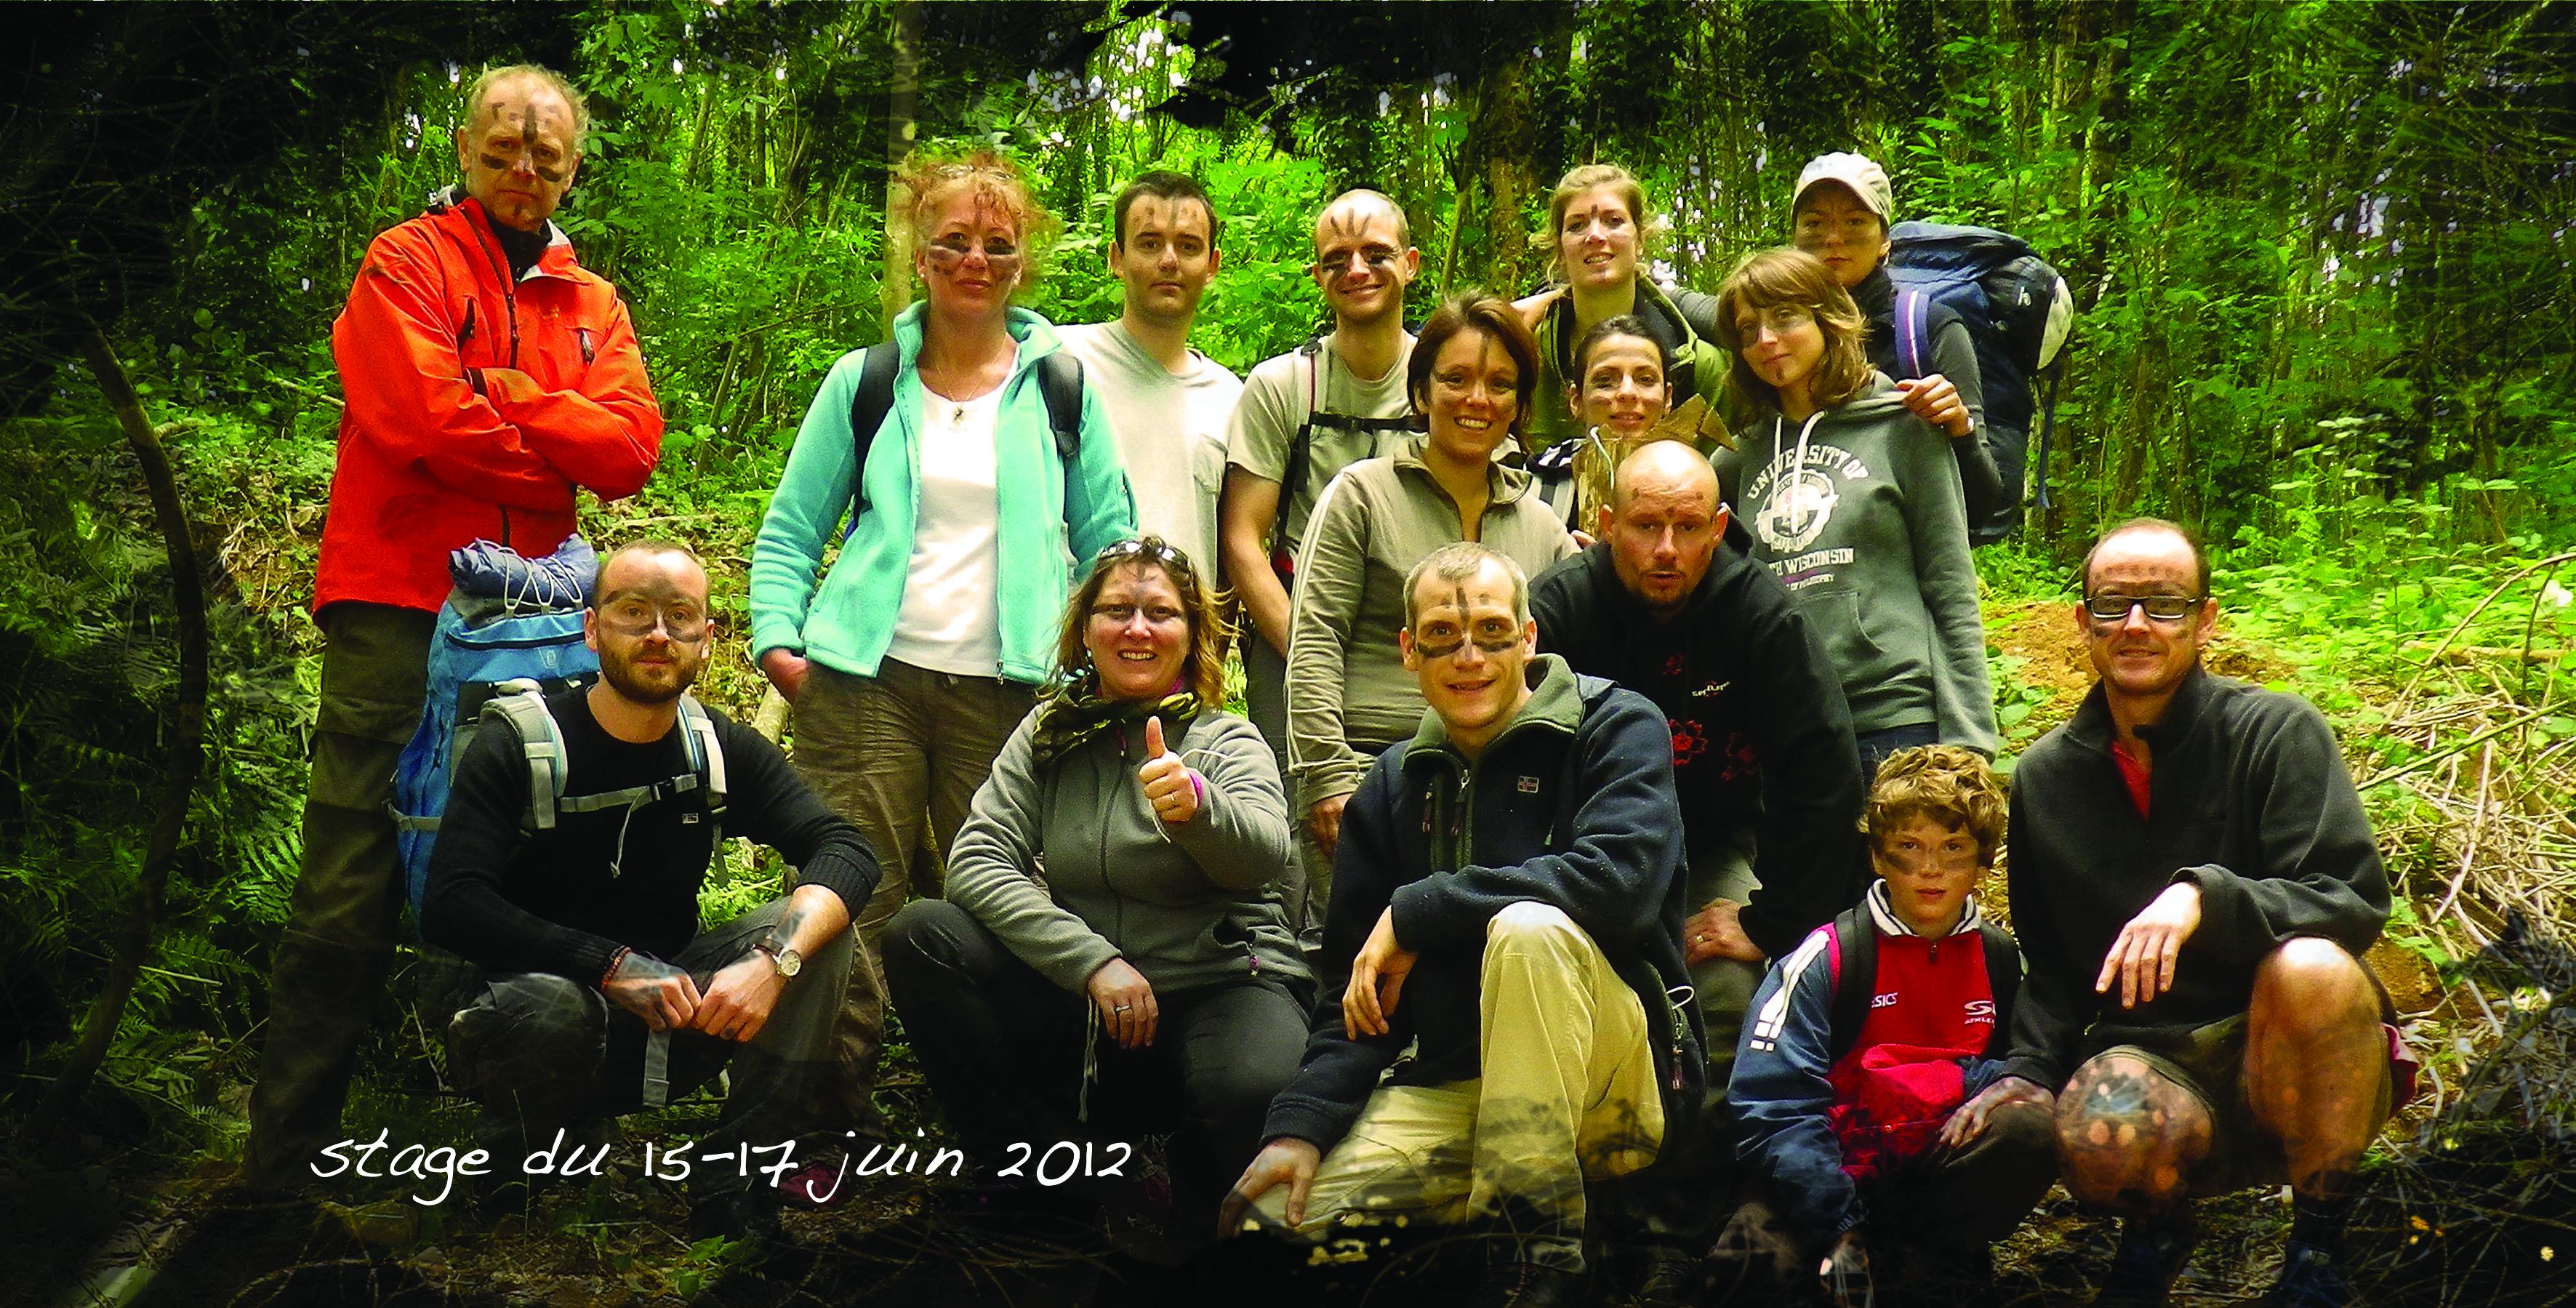 groupe stage 15-17juin2012.jpg